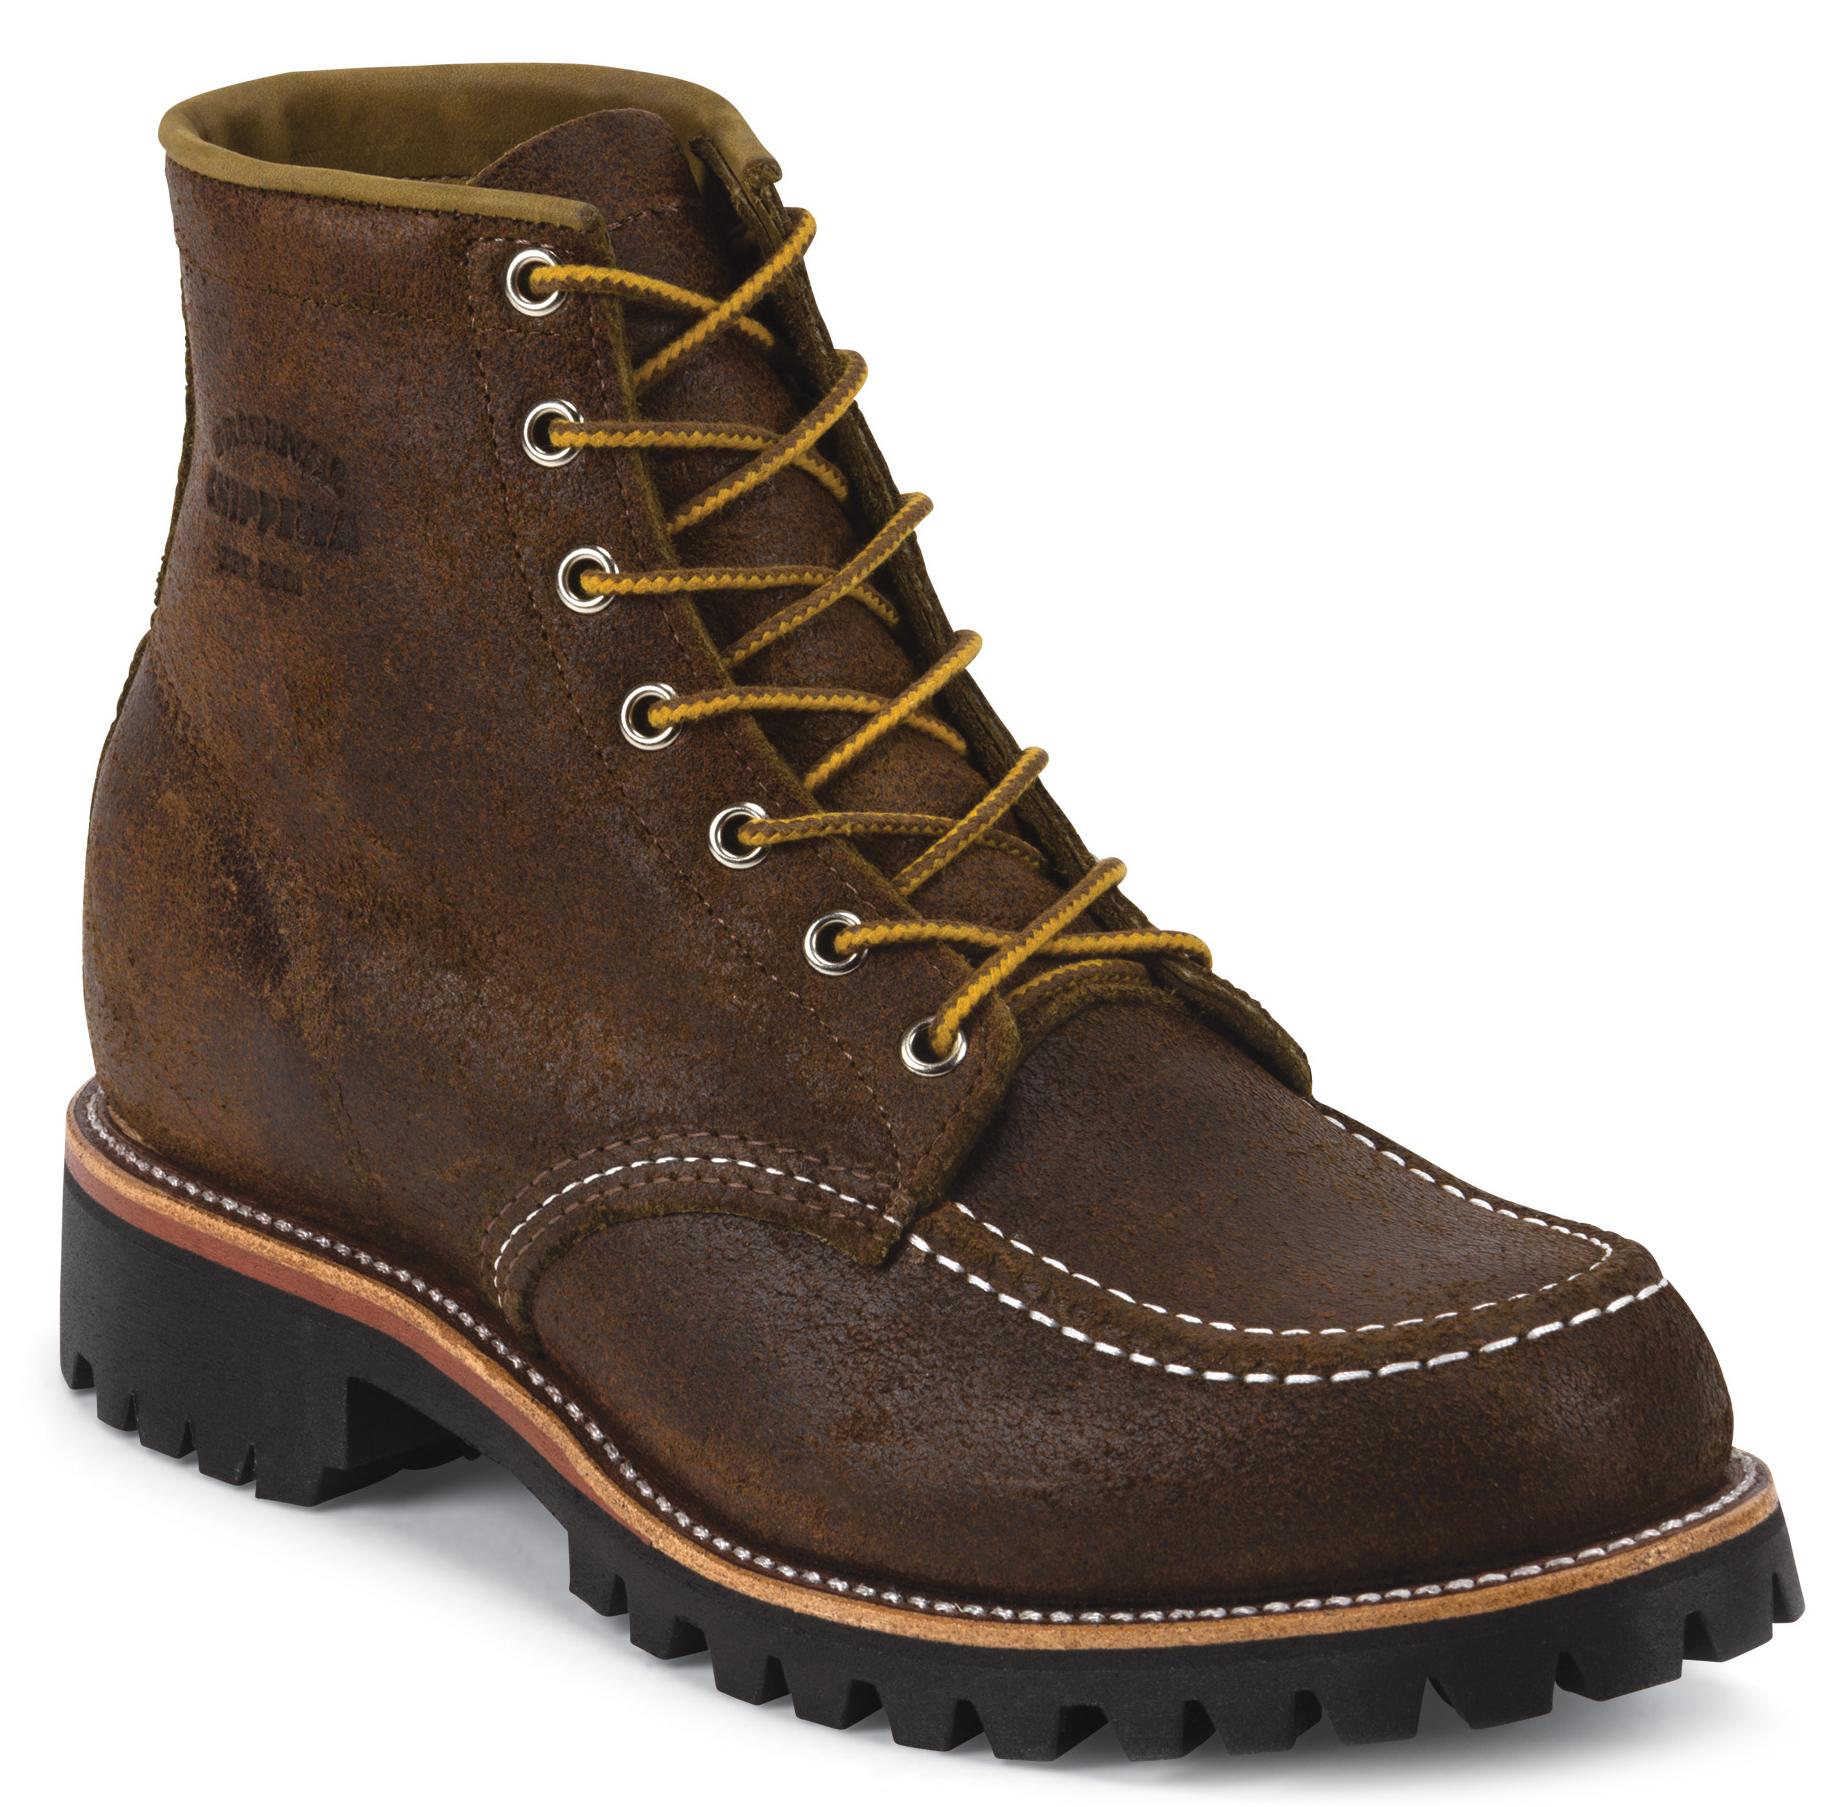 Suede Steel Toe Shoes